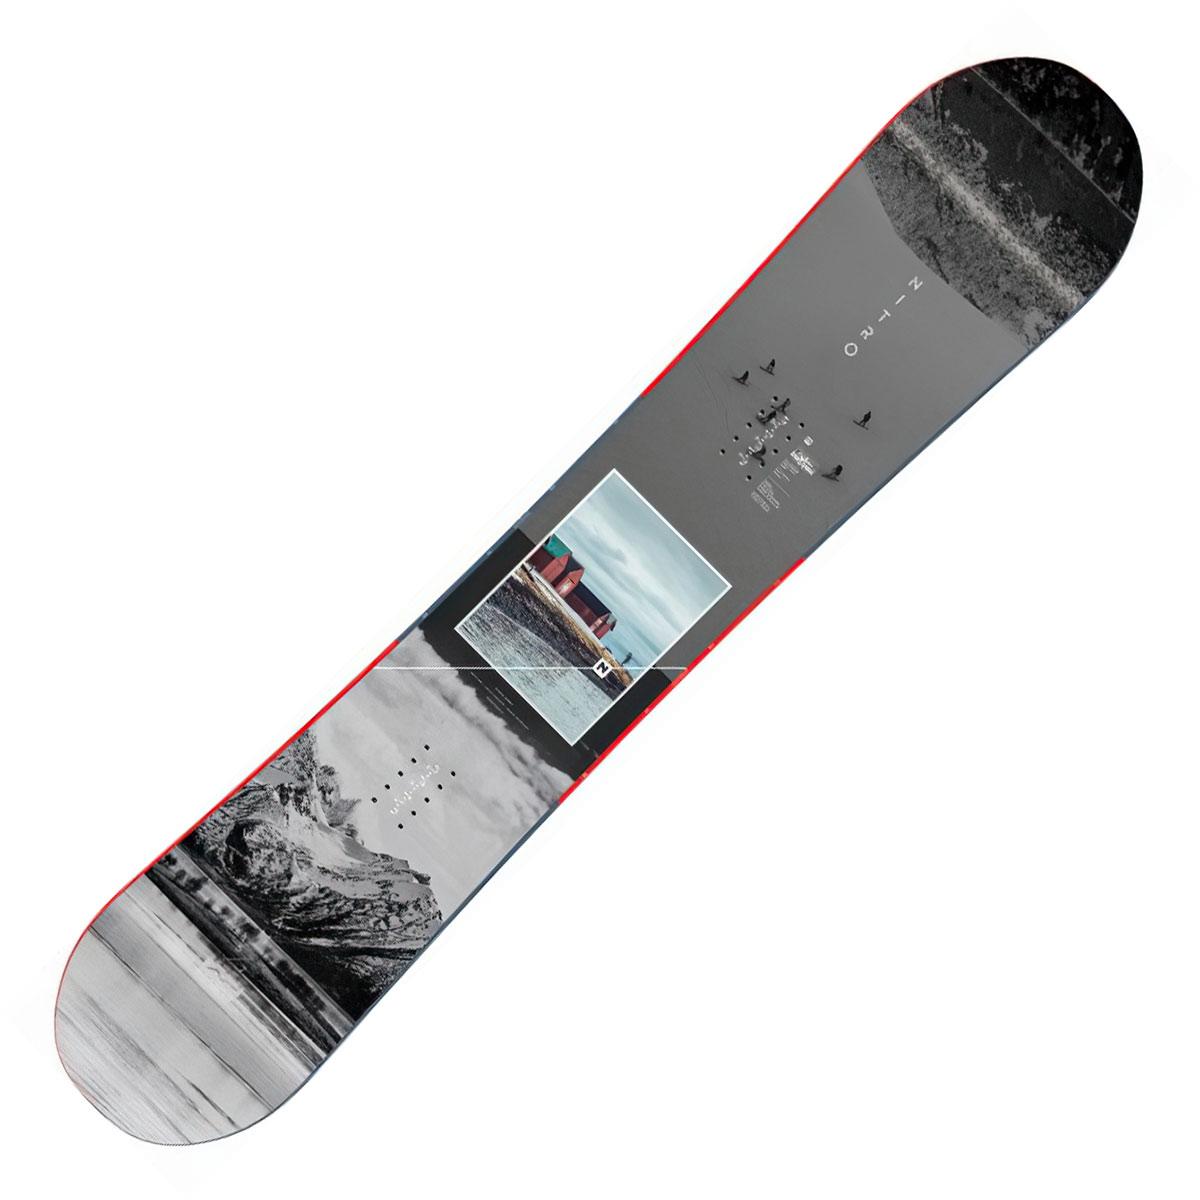 Snowboard Nitro Team Exposure Gullwing blu fantasia (Colore: blu fantasia, Taglia: 159)